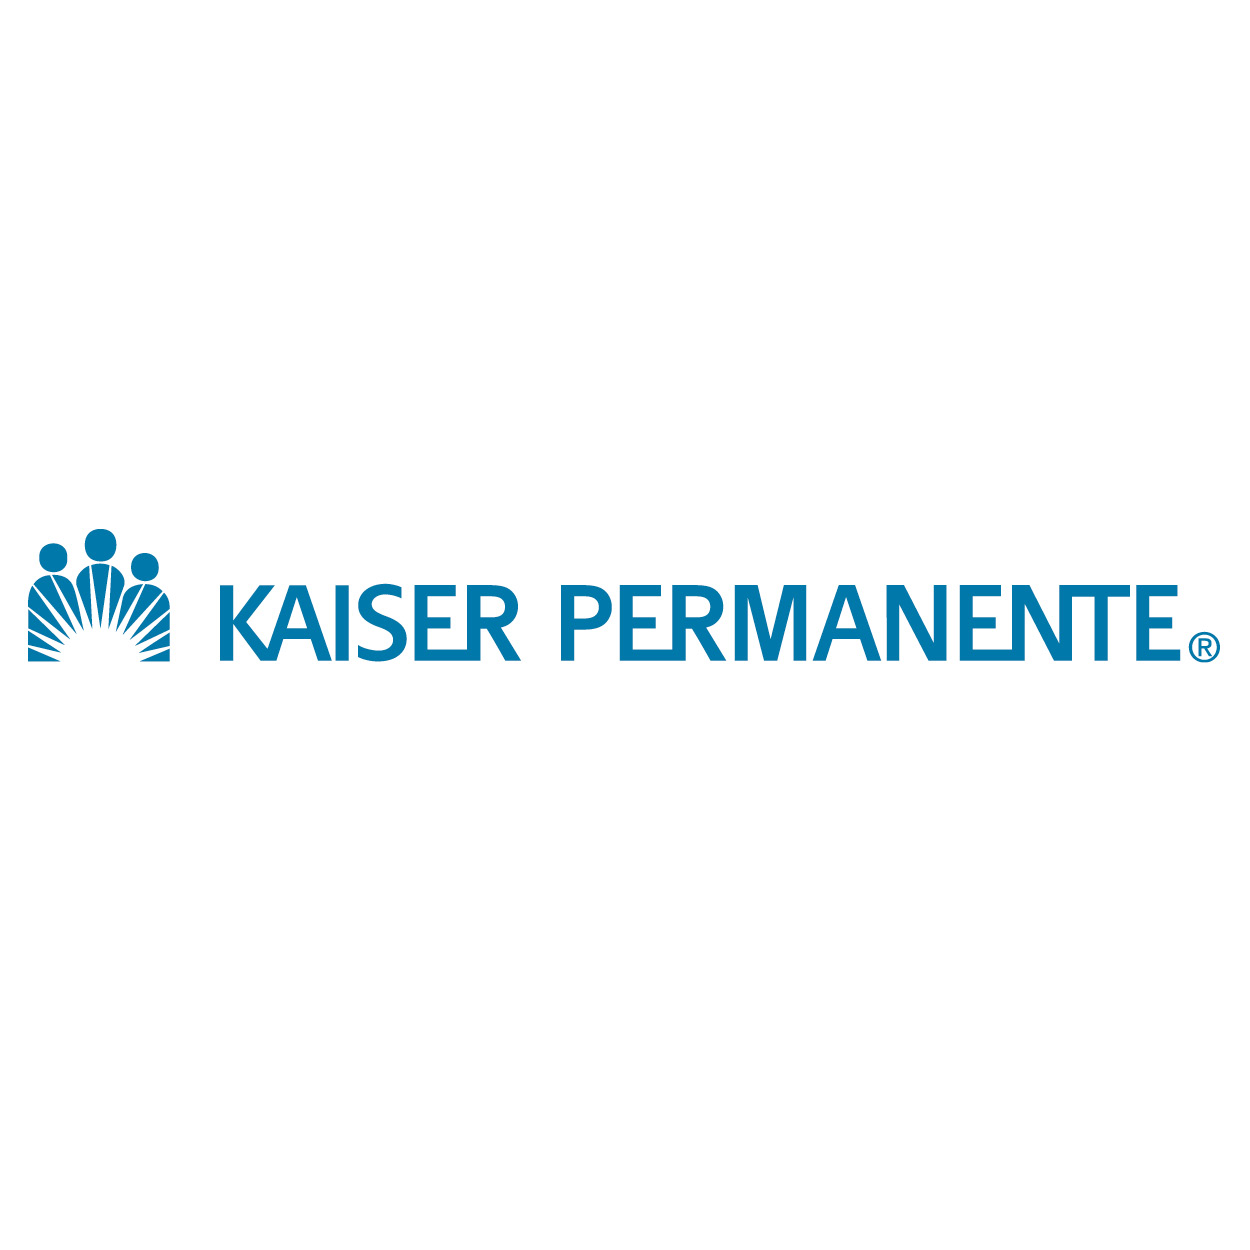 kaiser permanente insurance address photo - 1